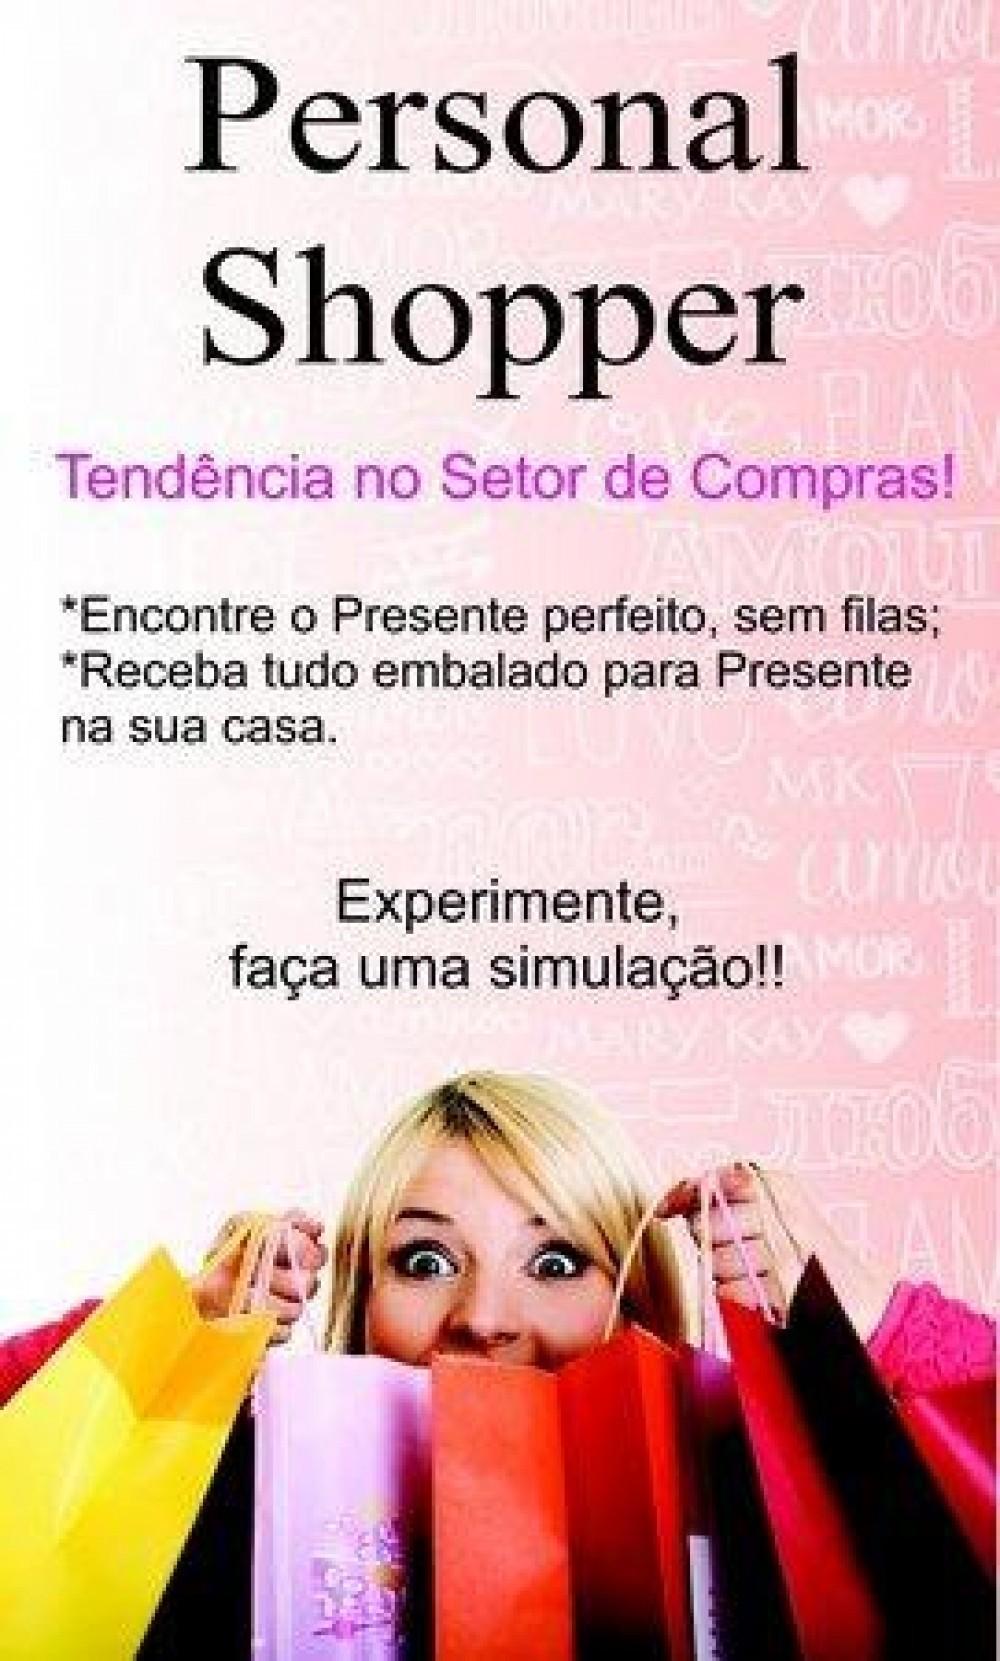 Personal shopper - Fazemo